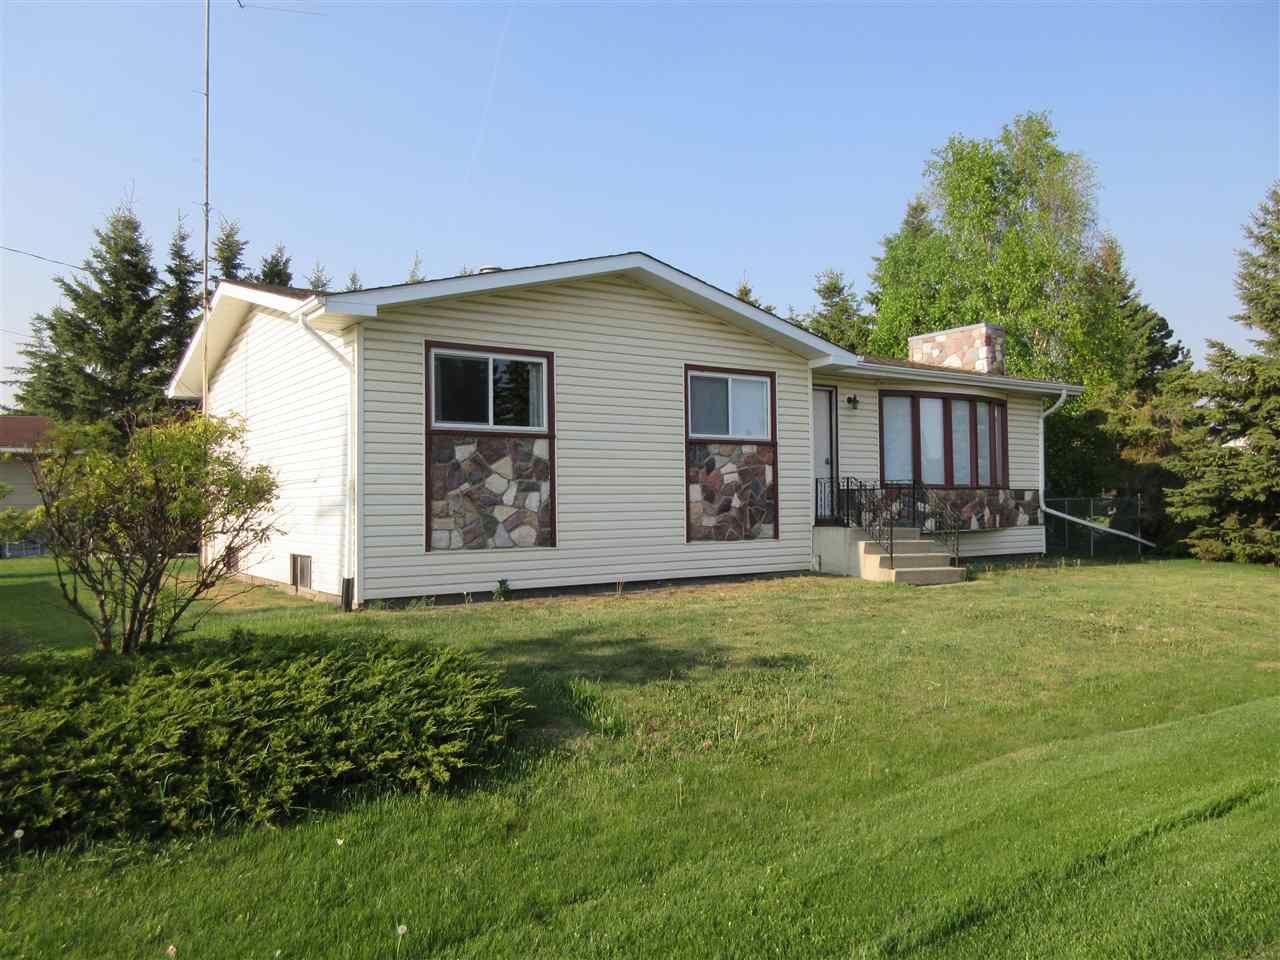 Main Photo: 5204 49 Street: Waskatenau House for sale : MLS®# E4159243